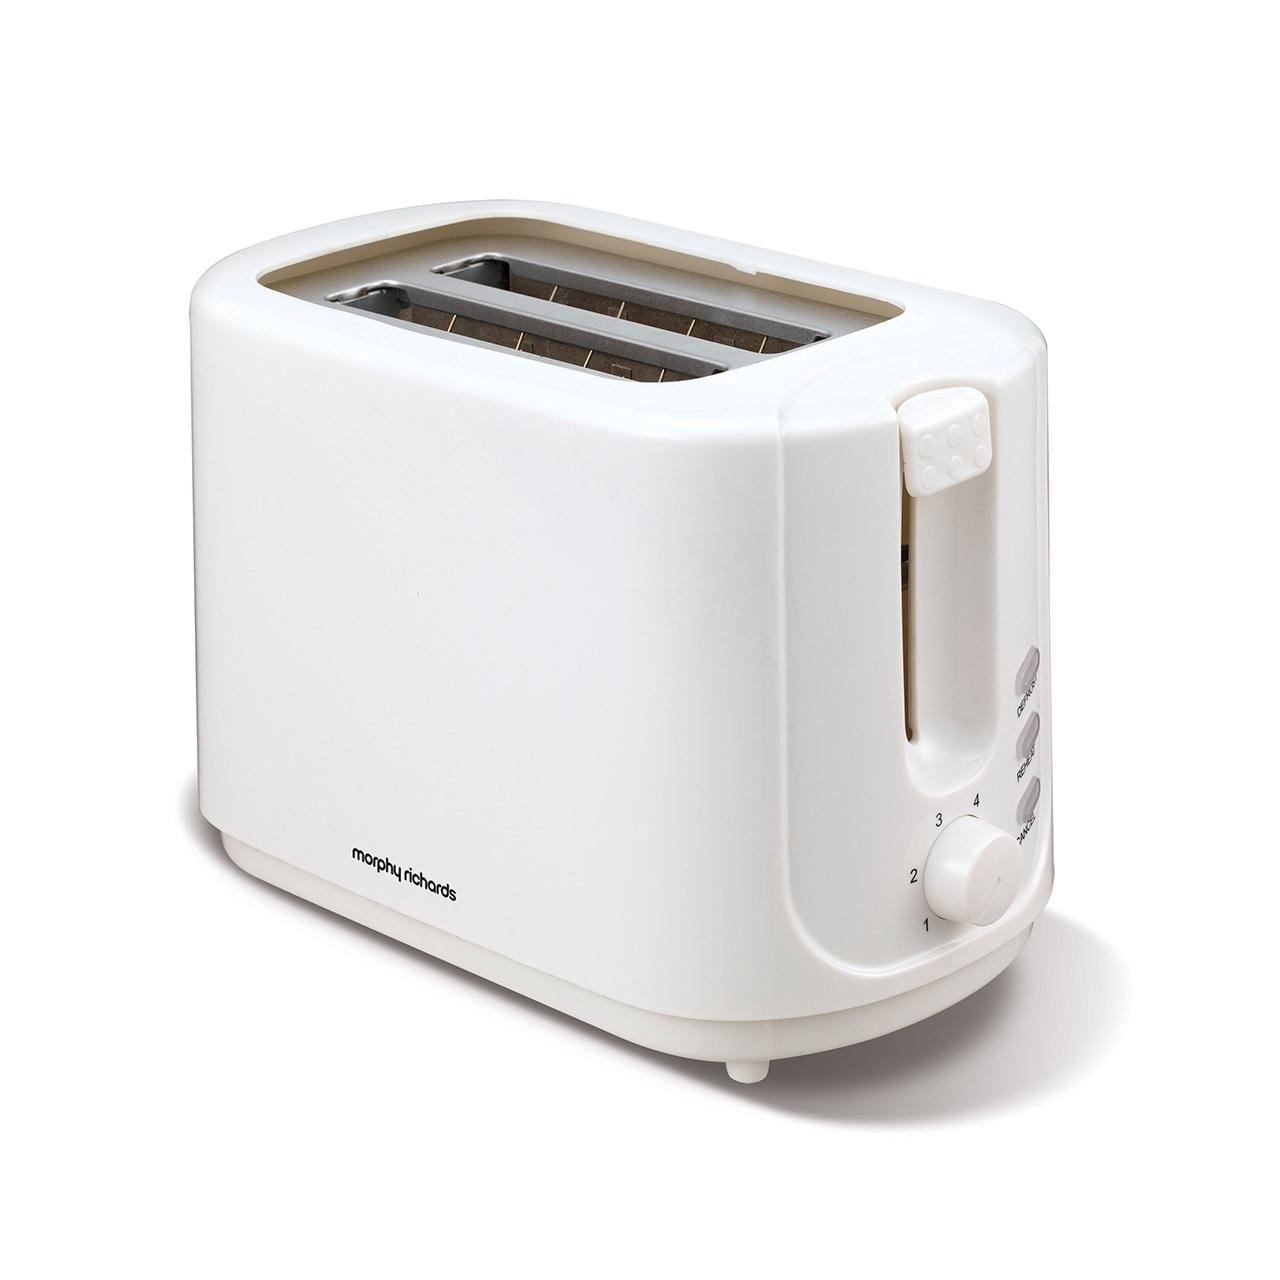 morphy richards   slice white toaster  soundstore - morphy richards   slice white toaster